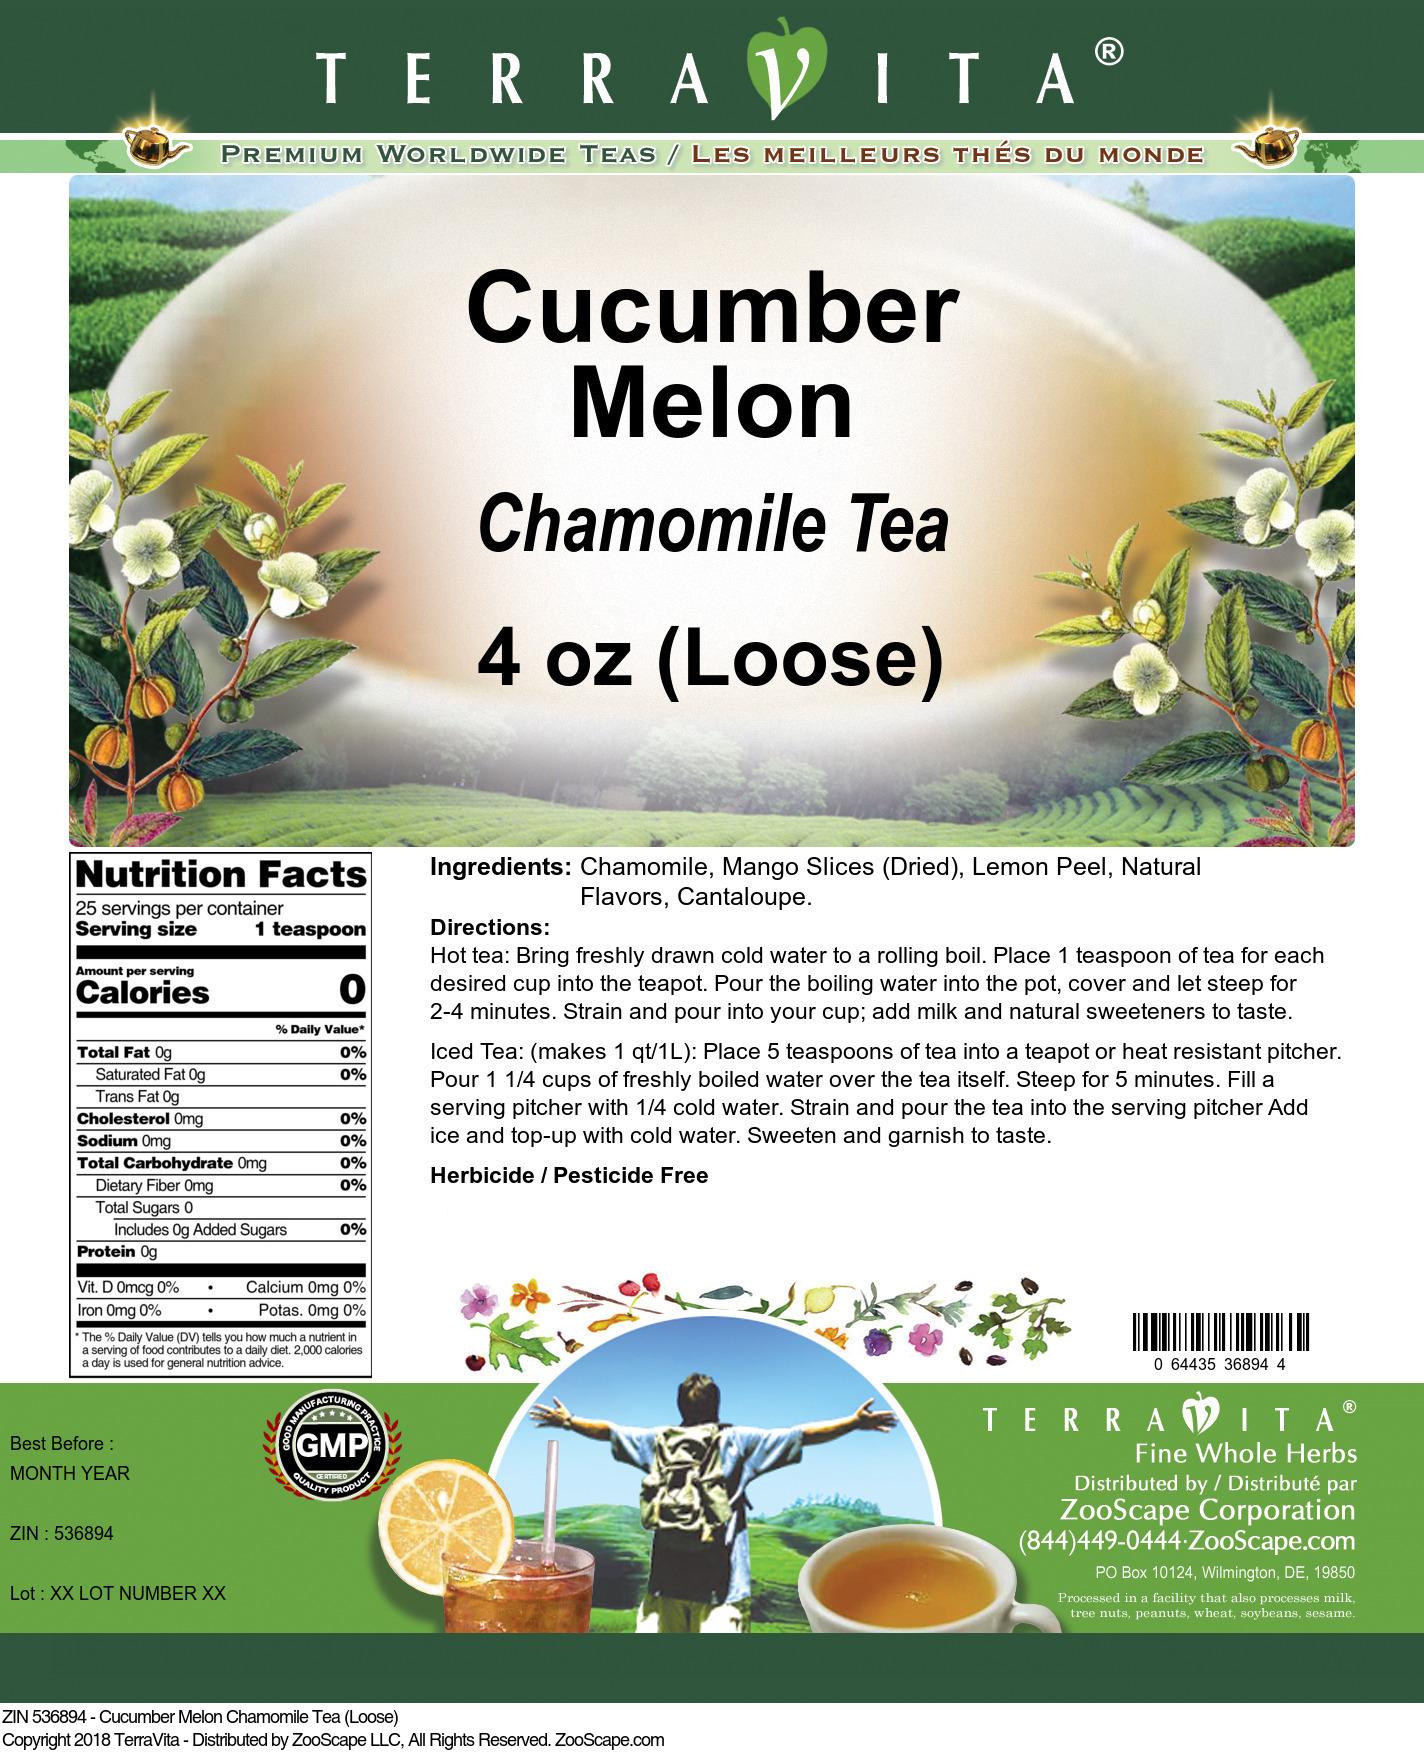 Cucumber Melon Chamomile Tea